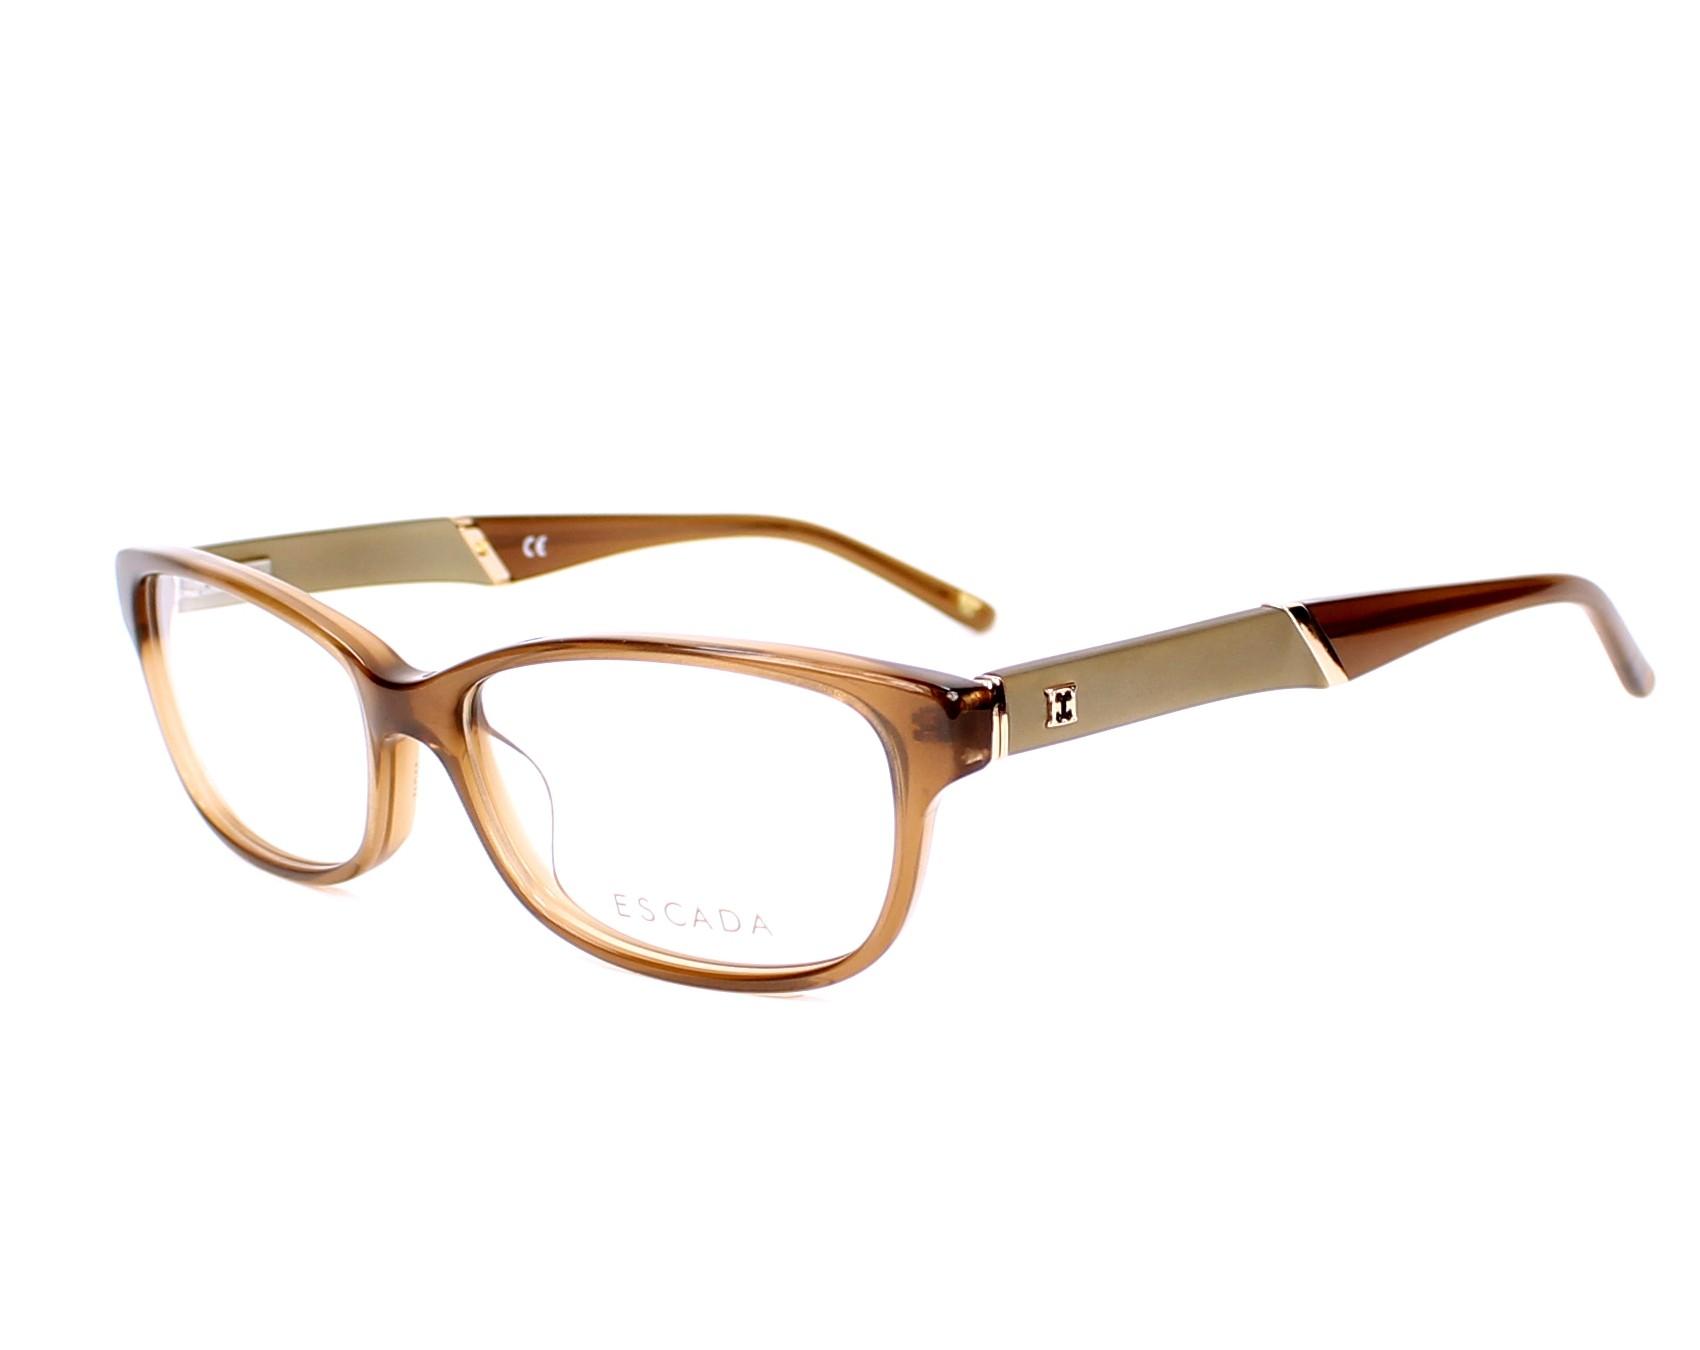 Glasses Frames Escada : Order your Escada eyeglasses VES261 0V67 53 today